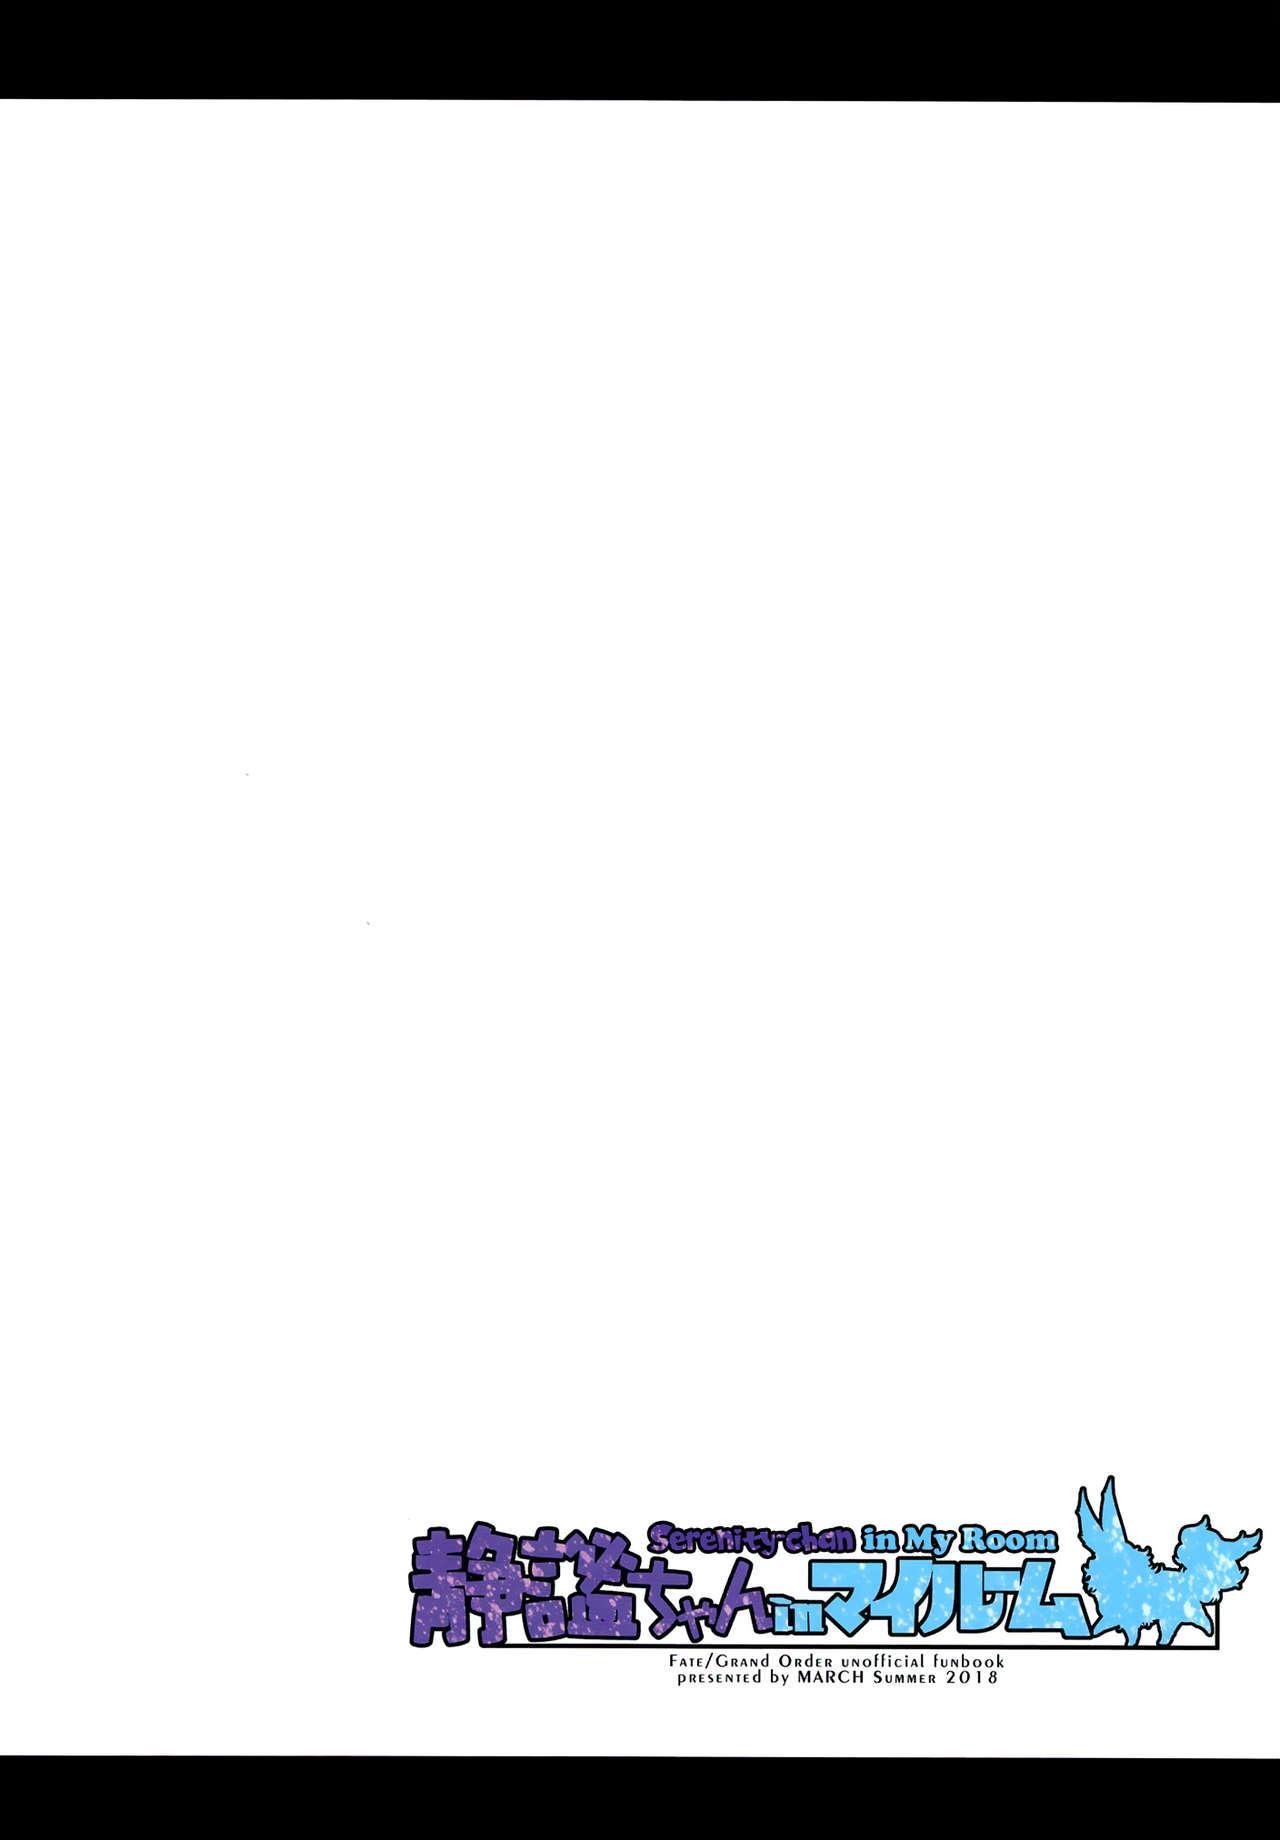 [MARCH (Minakuchi Takashi)] Seihitsu-chan In My Room | Serenity-chan in My Room (Fate/Grand Order) [English] [Aoitenshi] [Digital] 30